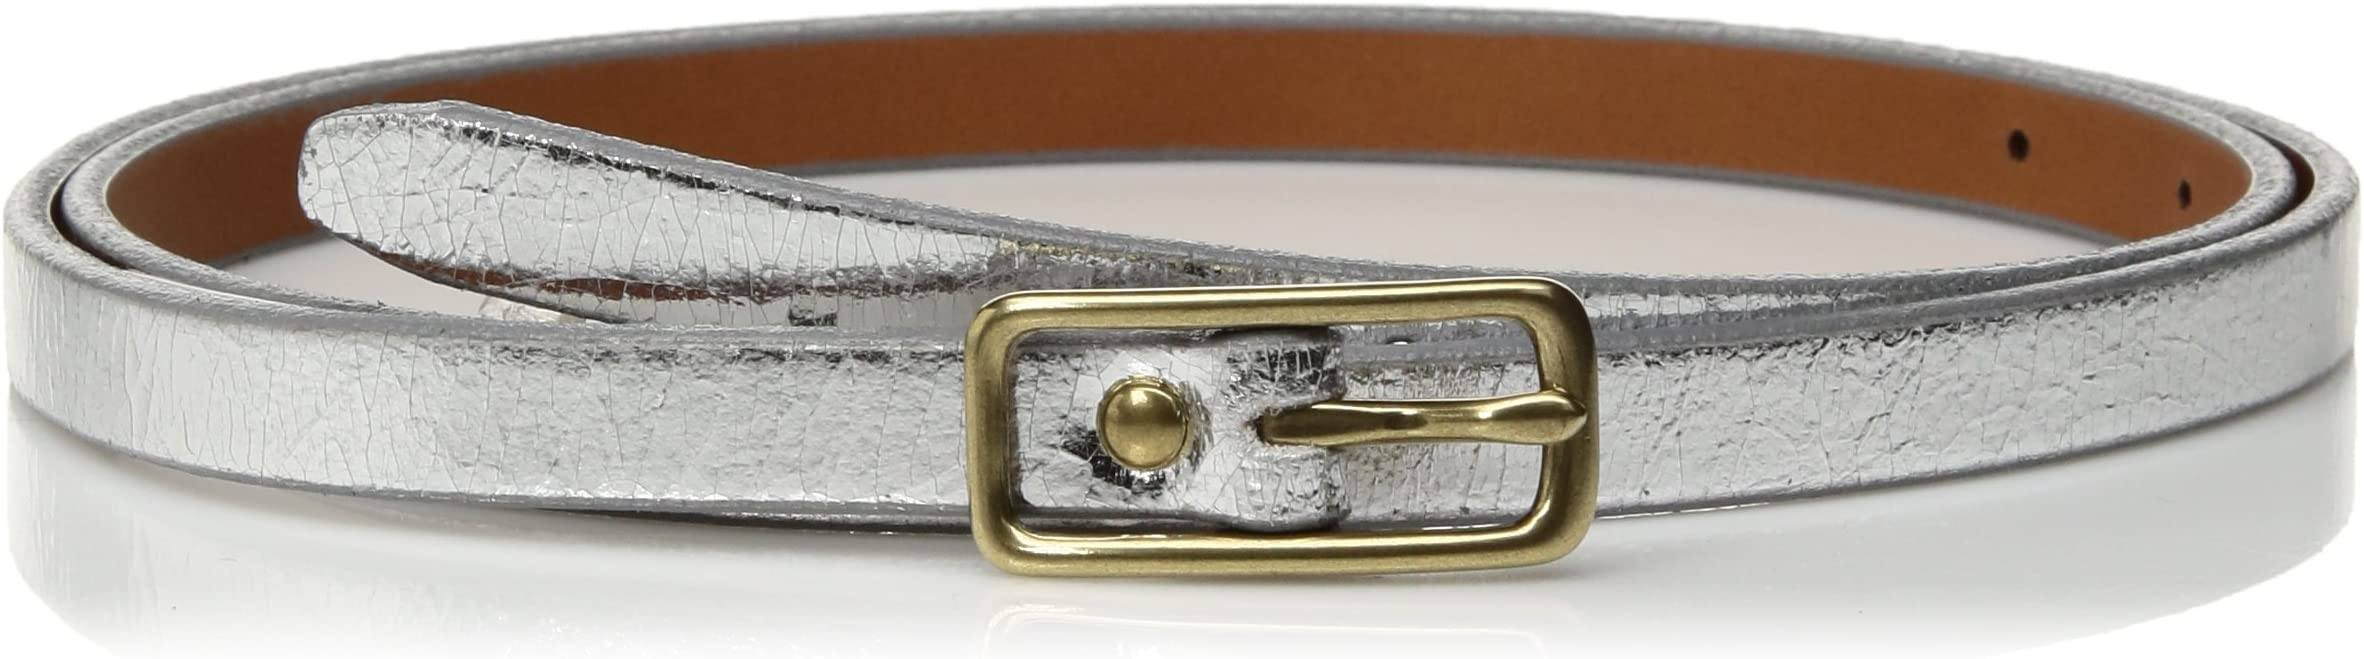 Circa Leathergoods Women's Crackle Metallic Belt